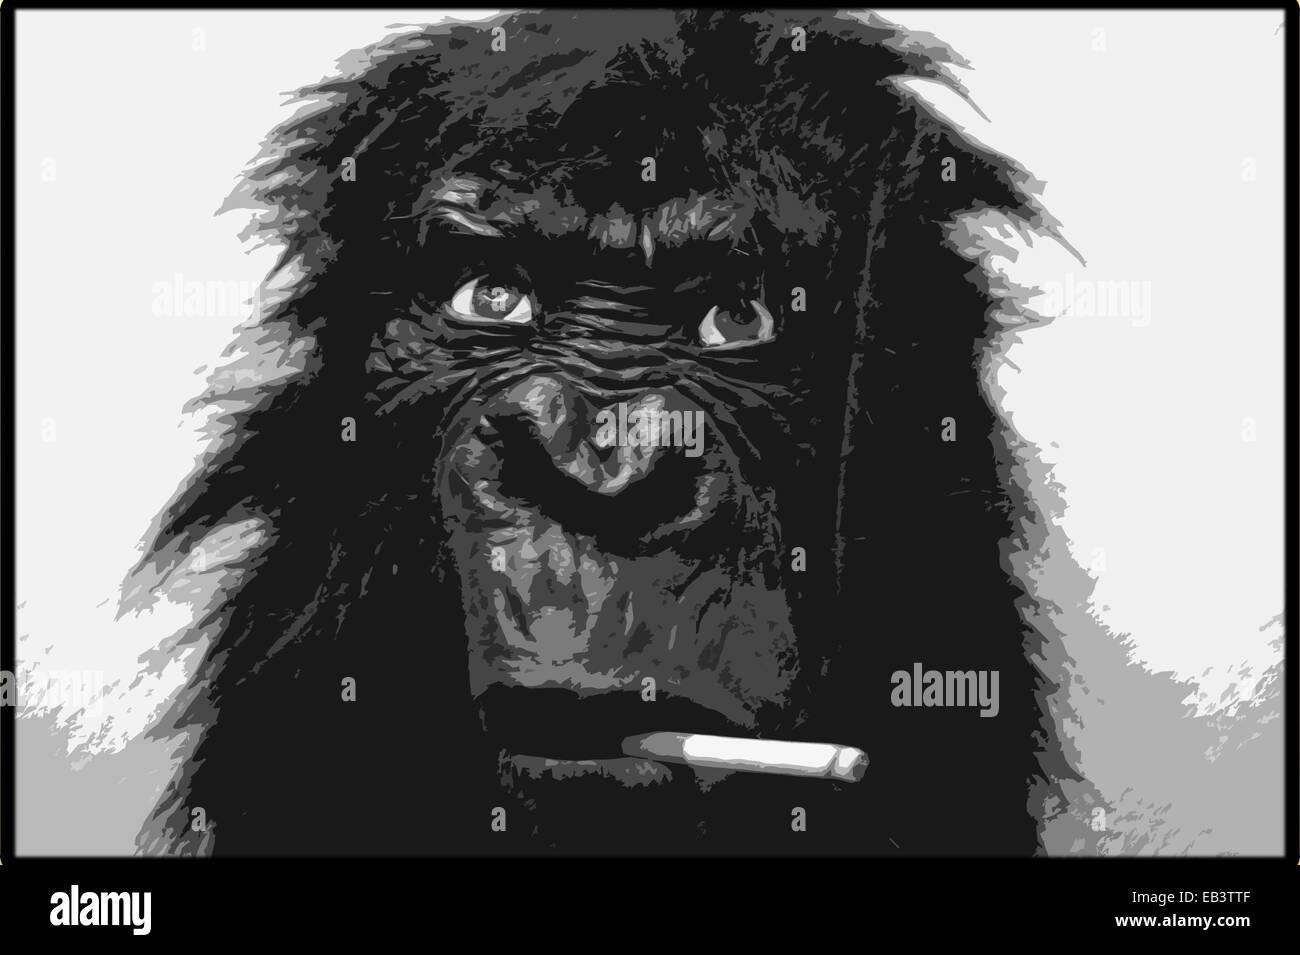 Studio Work, Monkey with Cigarette, Hamburg, Germany. - Stock Image